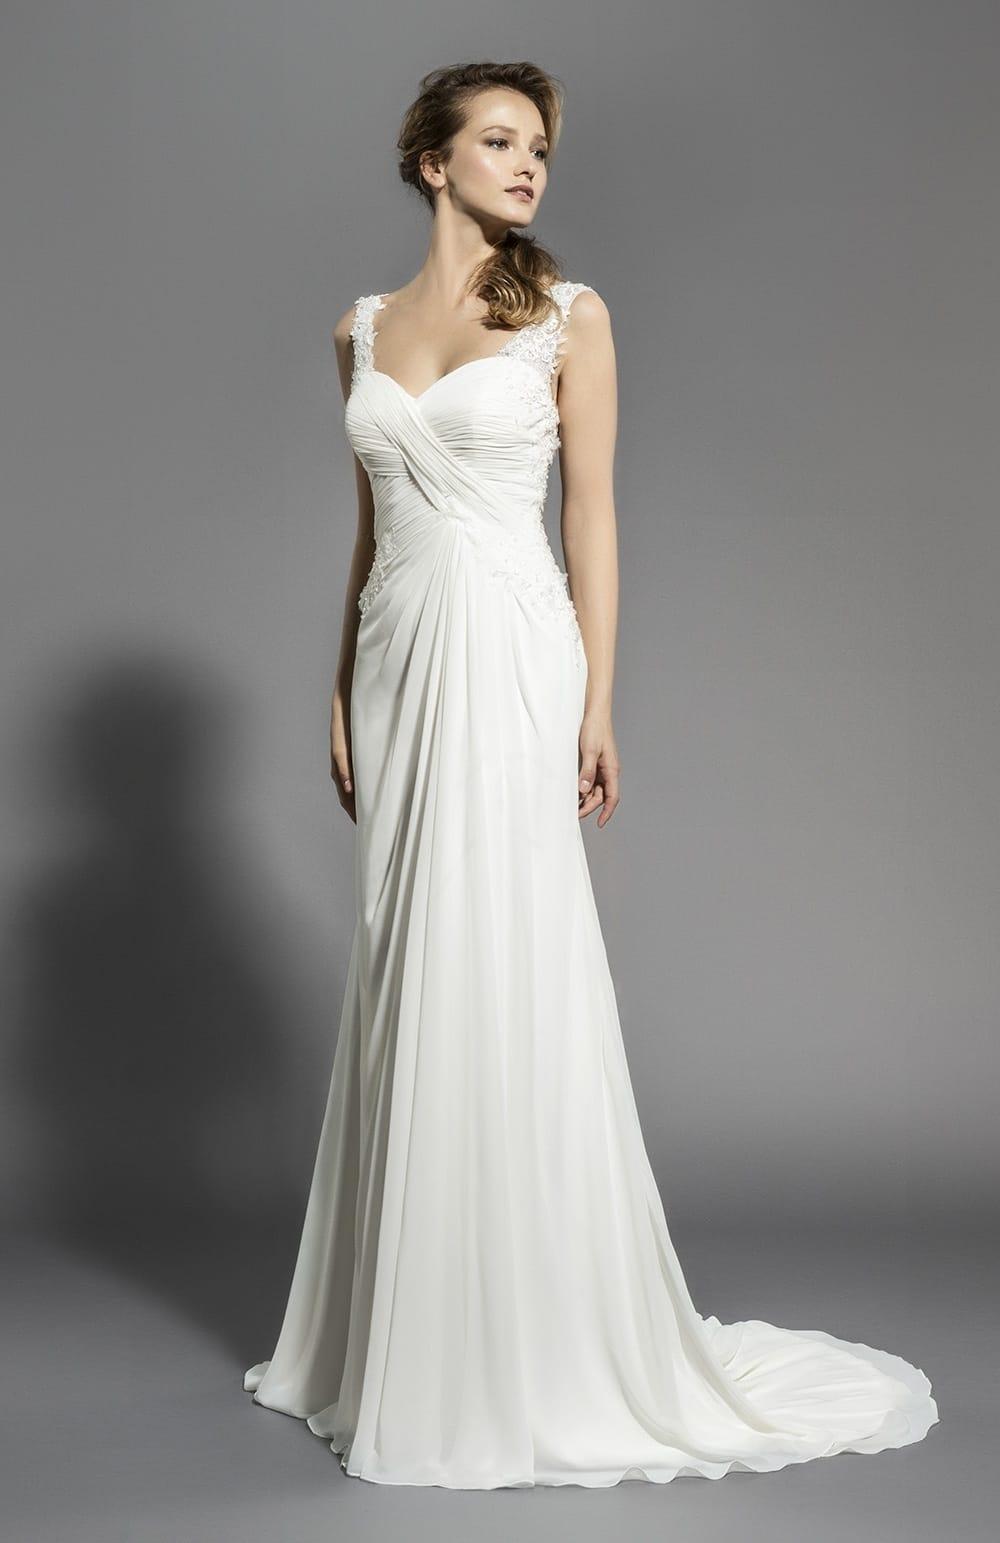 Robe de mariée Modèle Prescilla